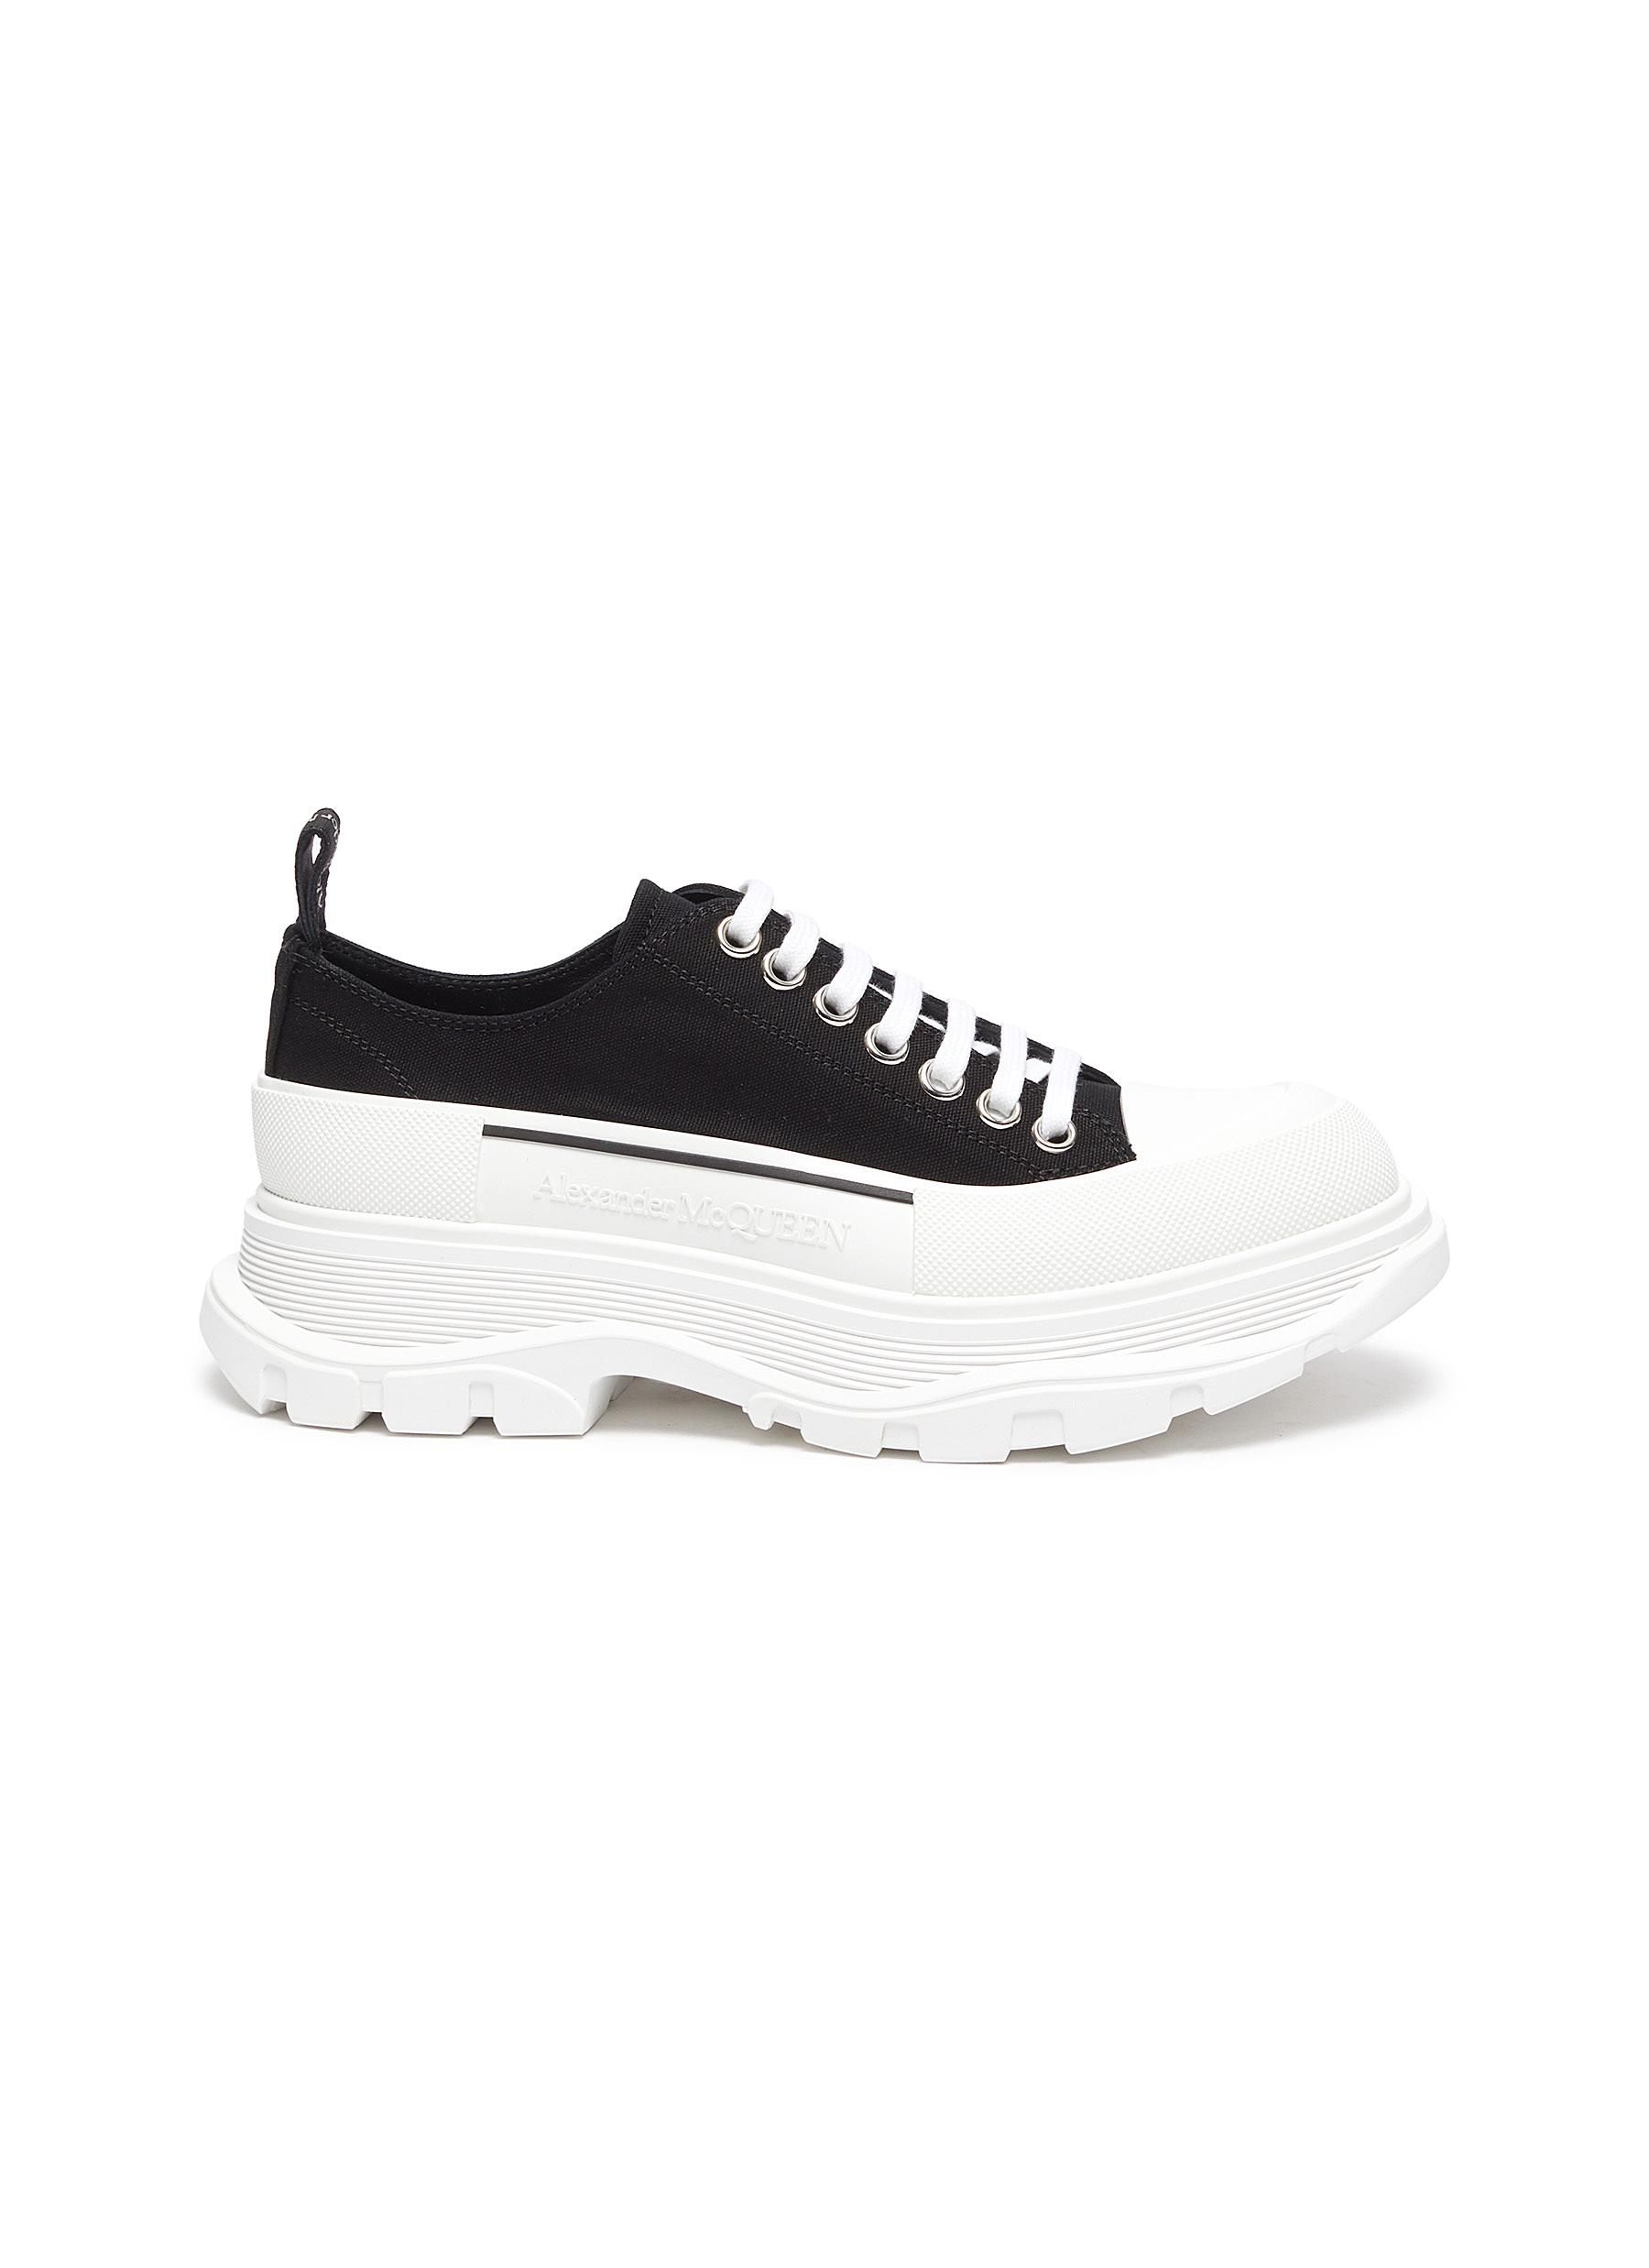 'Tread Slick' Platform Sole Sneakers